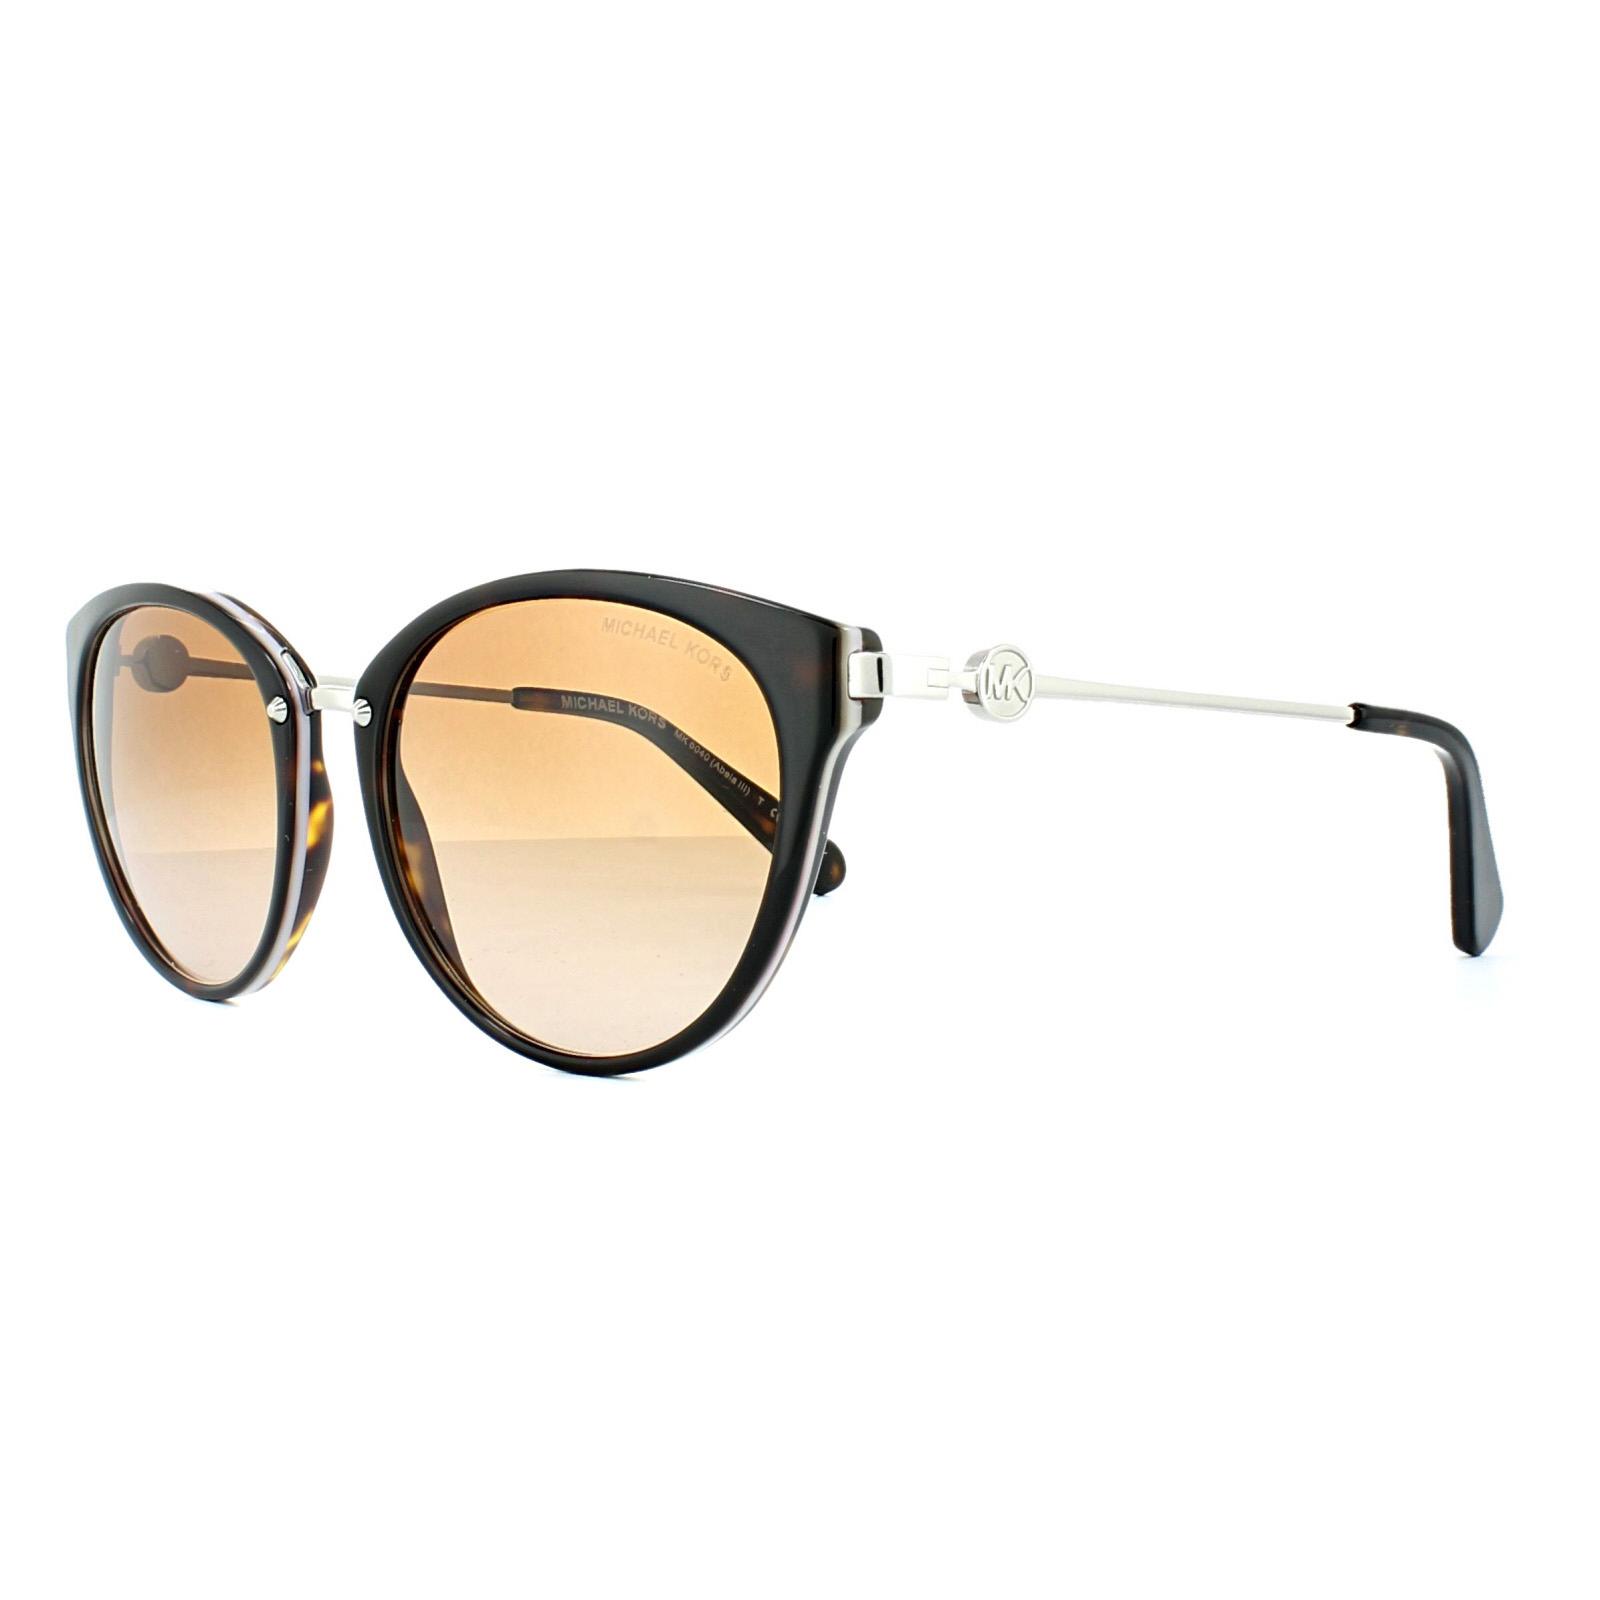 b2c089f564f10 Sentinel Michael Kors Sunglasses Abela III 6040 3145 13 Dark Havana Lilac  Brown Gradient